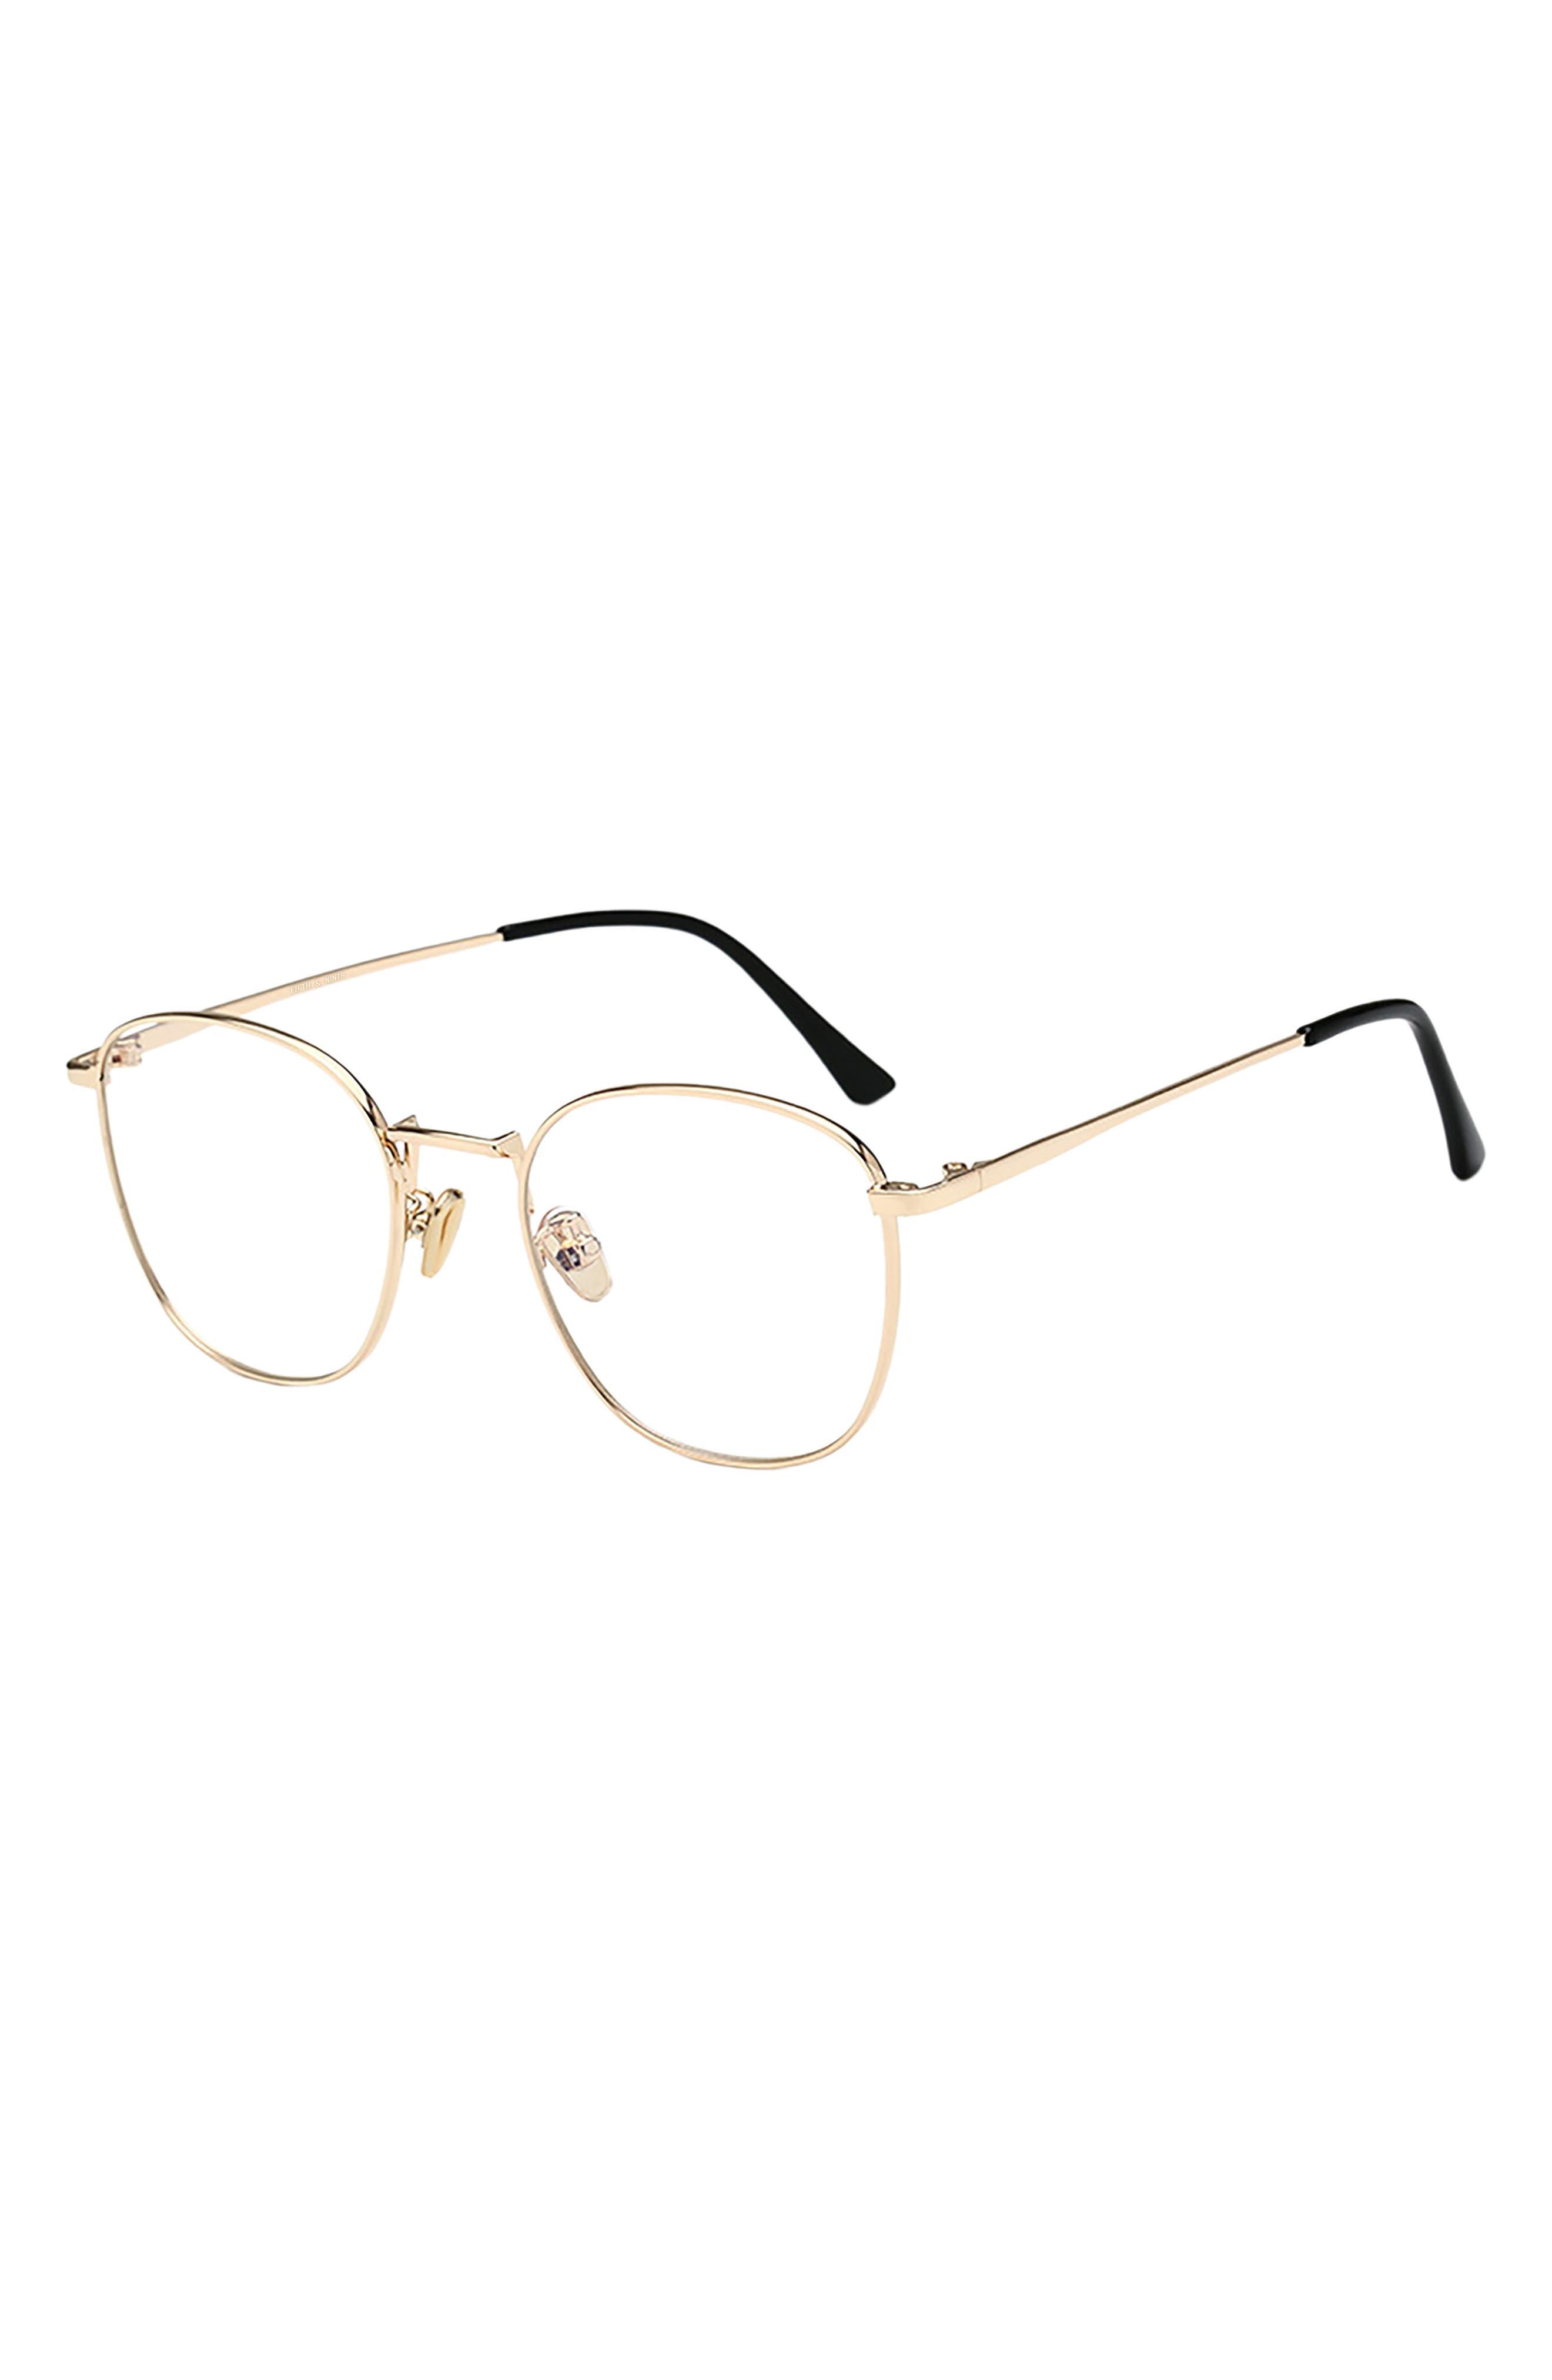 Indy 51mm Round Blue Light Blocking Glasses